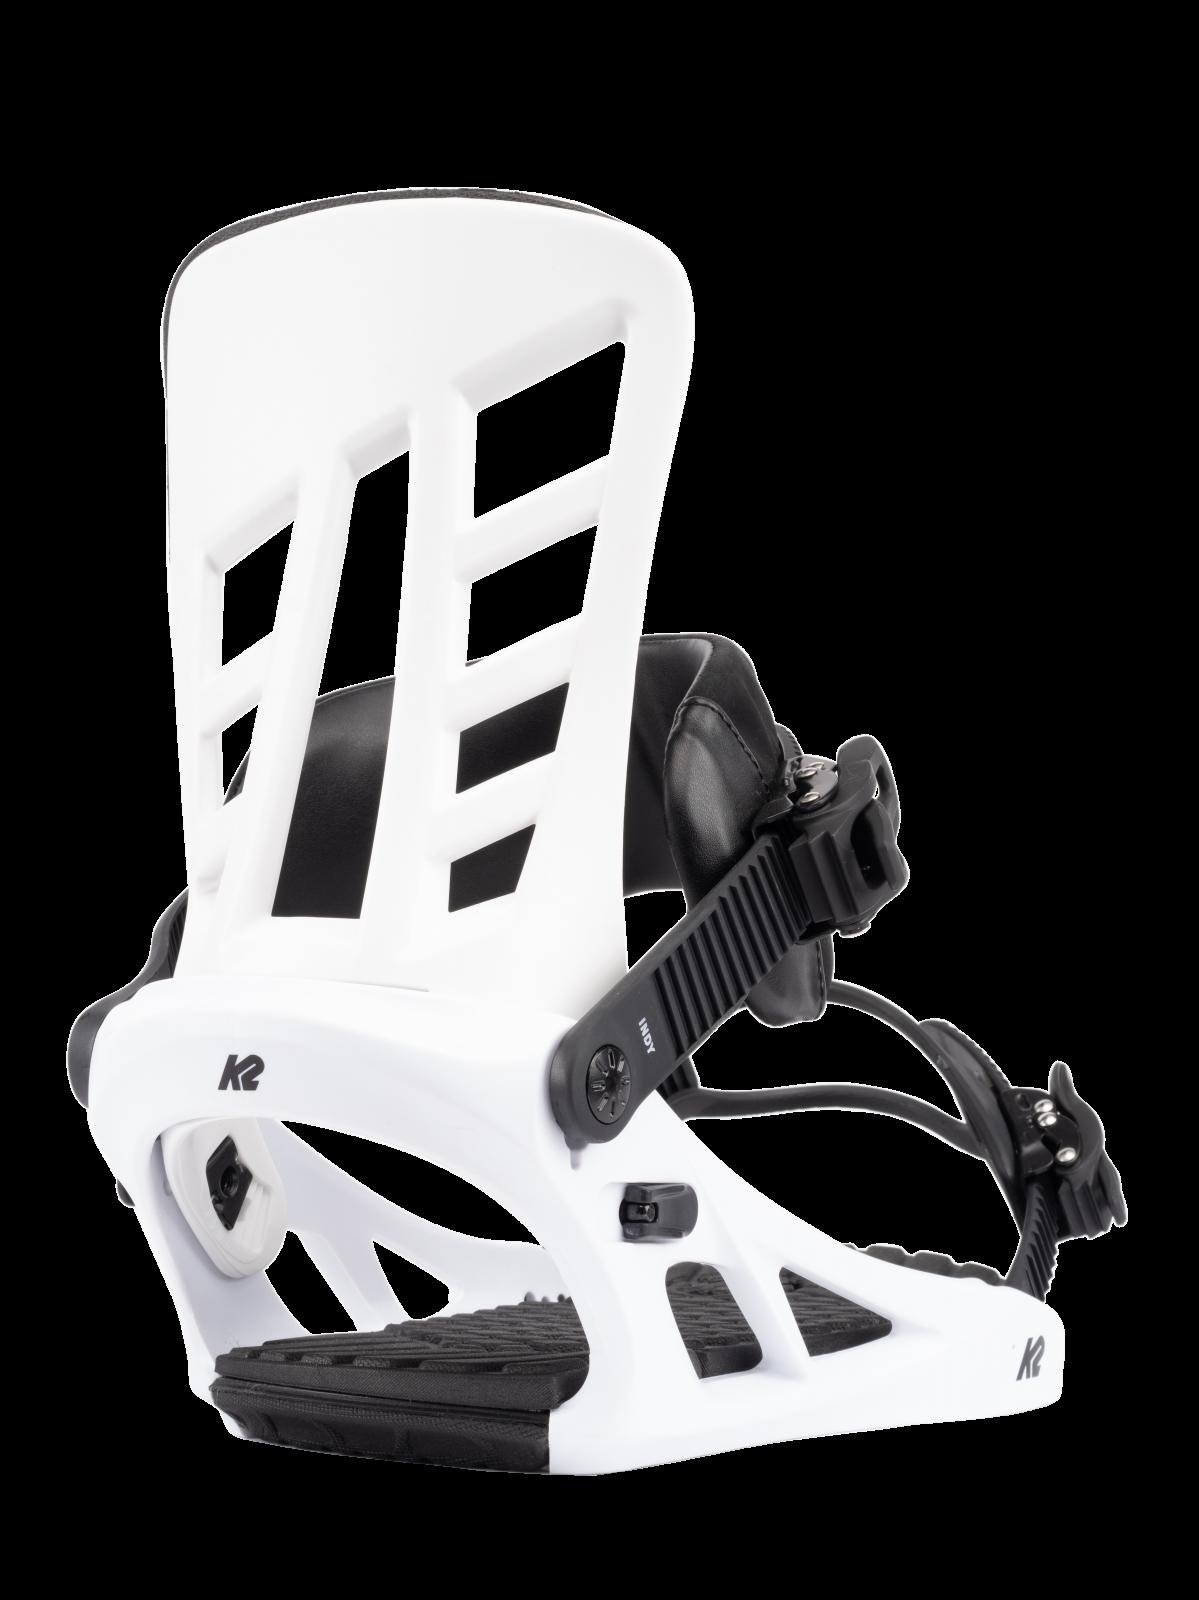 2022 K2 Indy Men's Snowboard Bindings